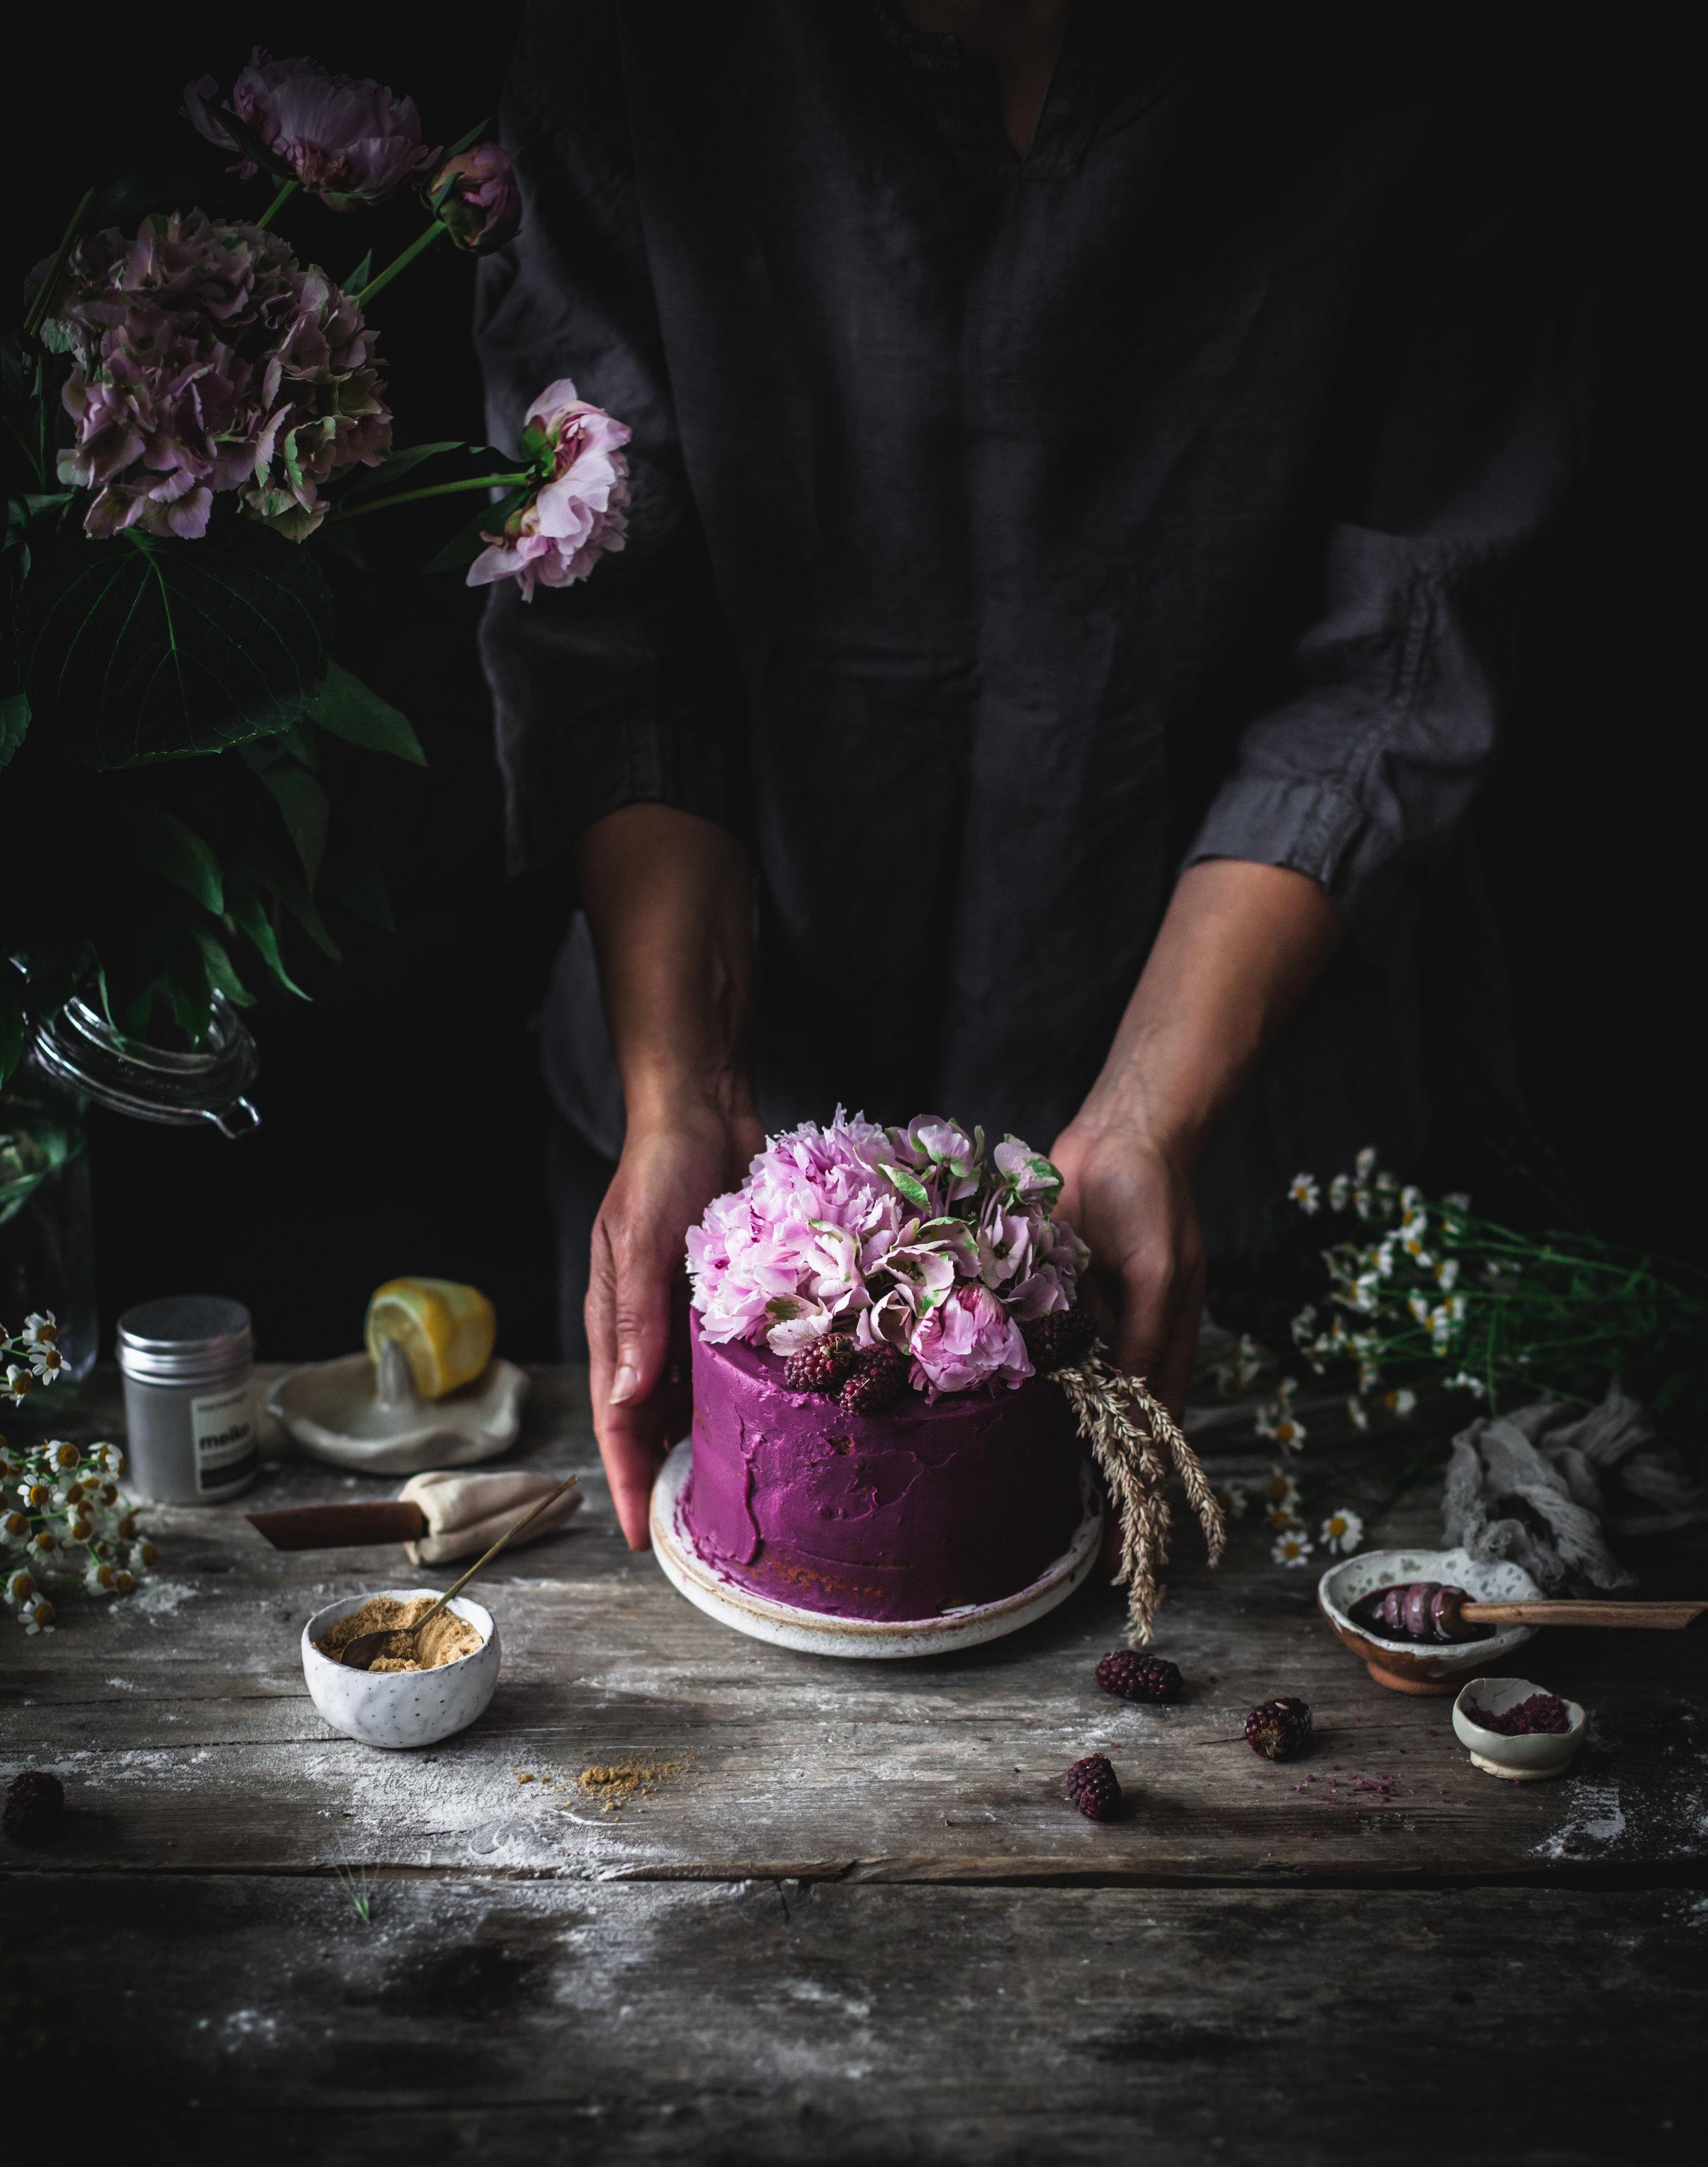 purple potatoes and white chocolate vegan cake